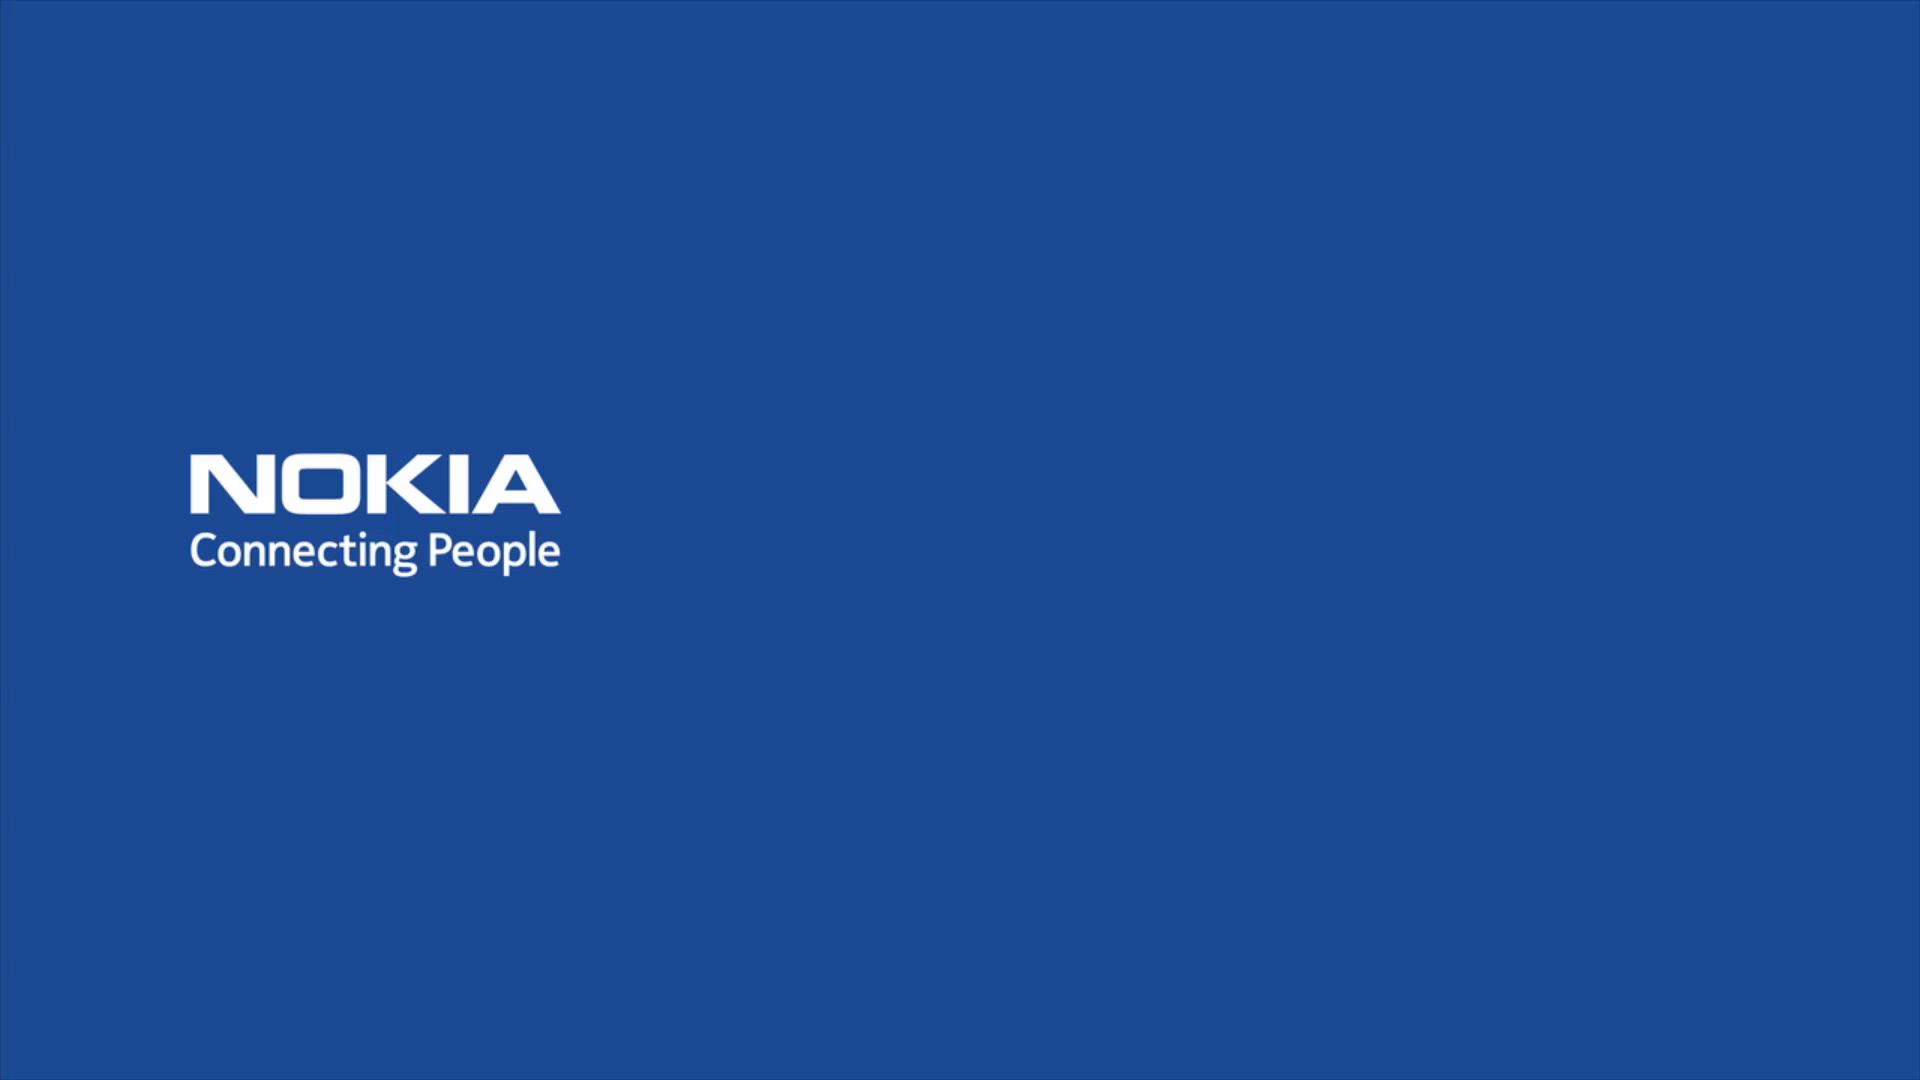 49] Nokia HD Wallpapers on WallpaperSafari 1920x1080